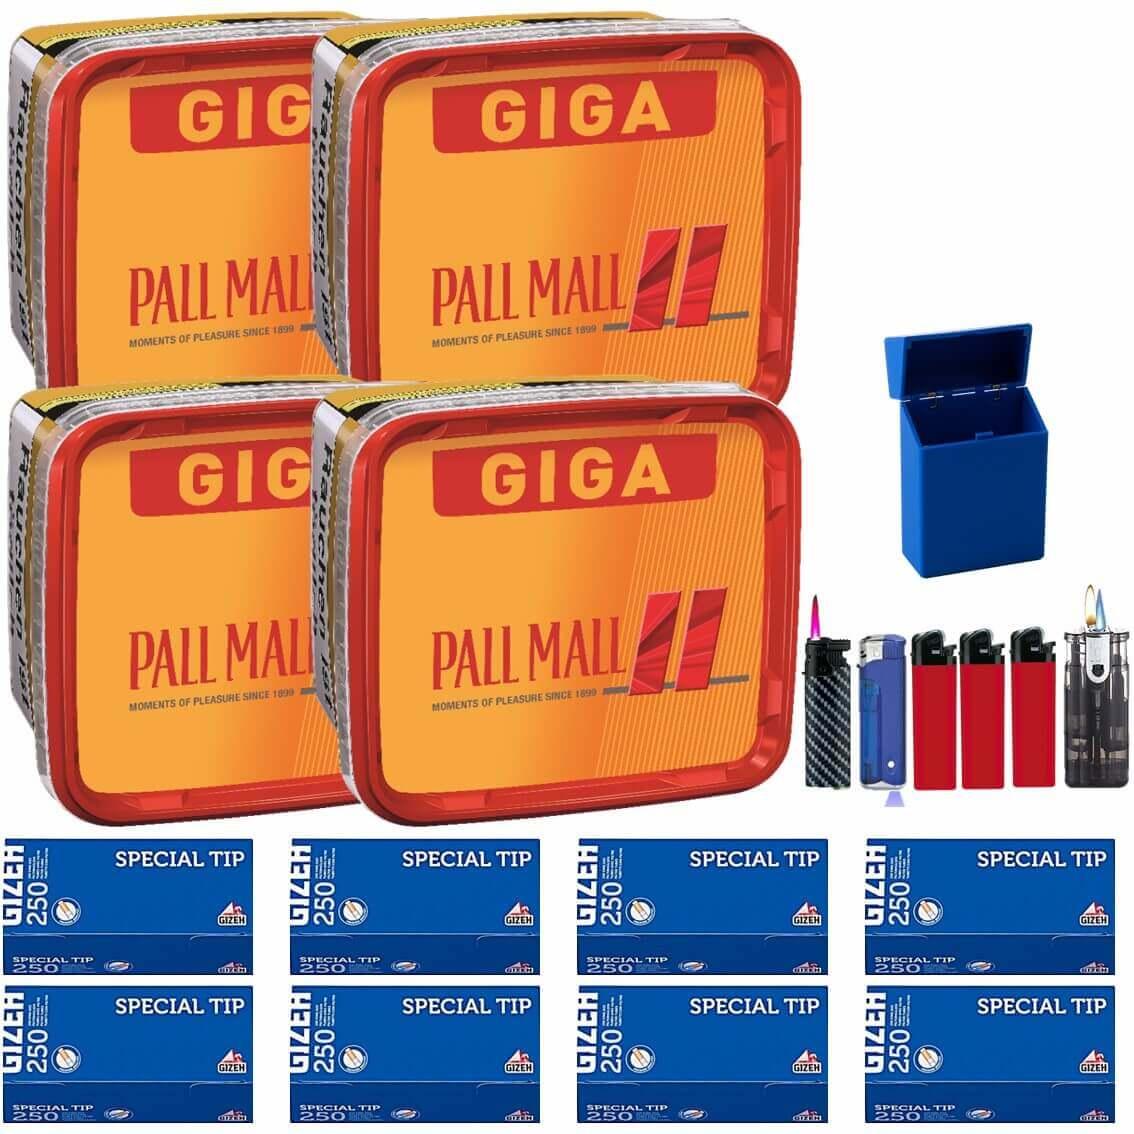 Pall Mall Giga Box 4 x 280g Volumentabak 2000 Special Size Filterhülsen Uvm.